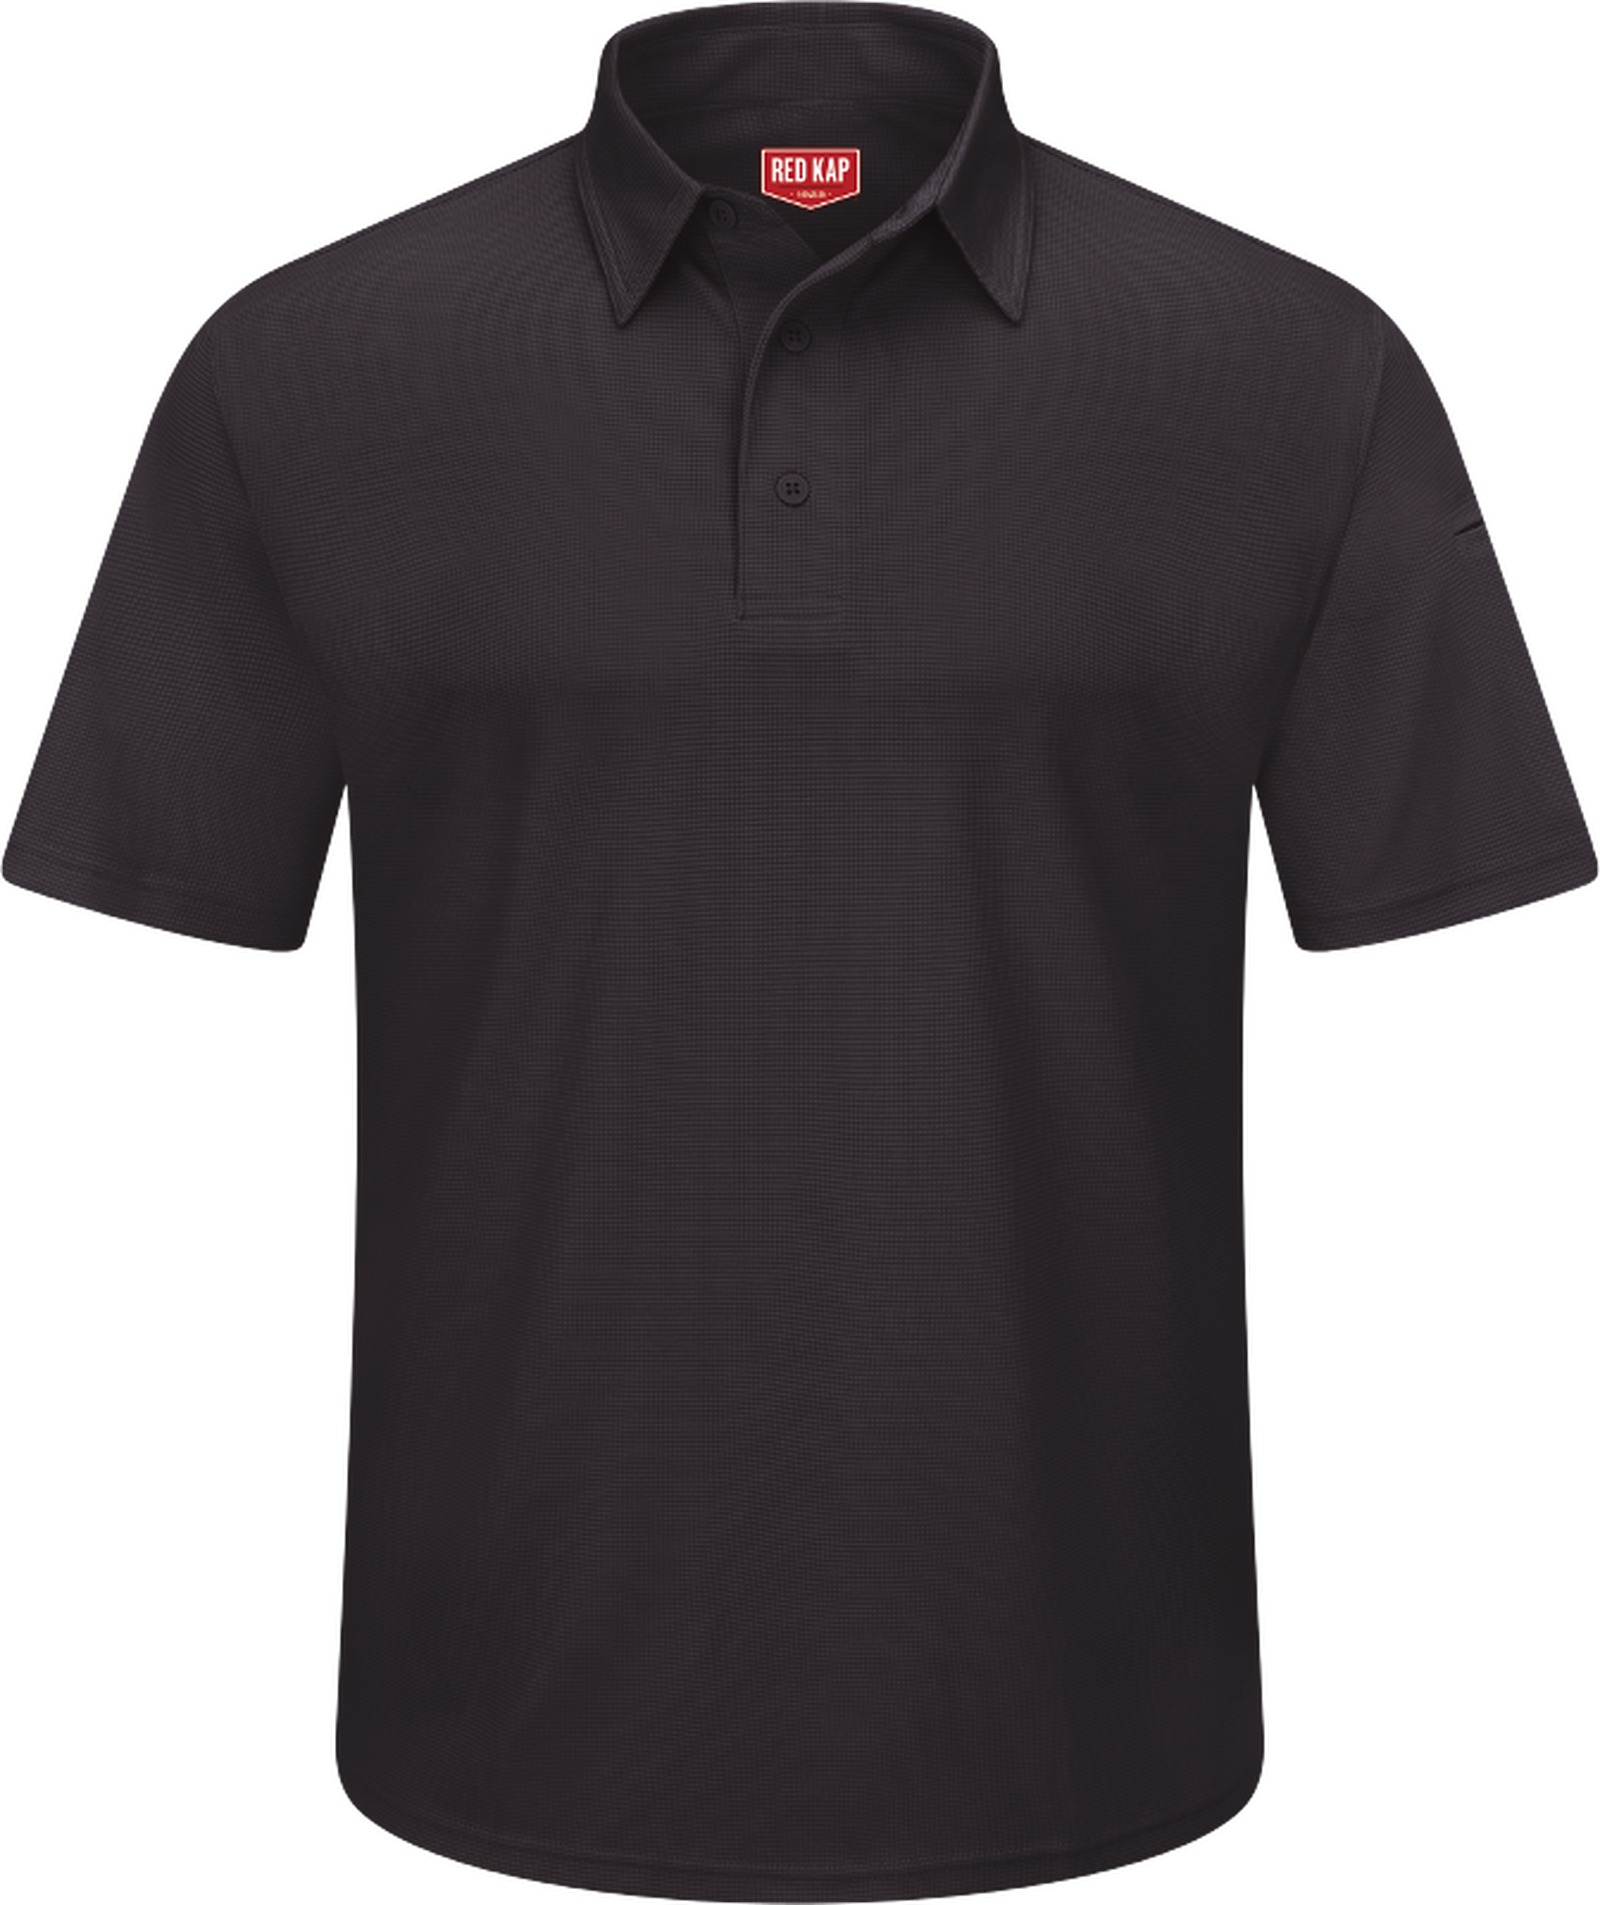 Men's Short Sleeve Performance Knit® Flex Series Pro Polo